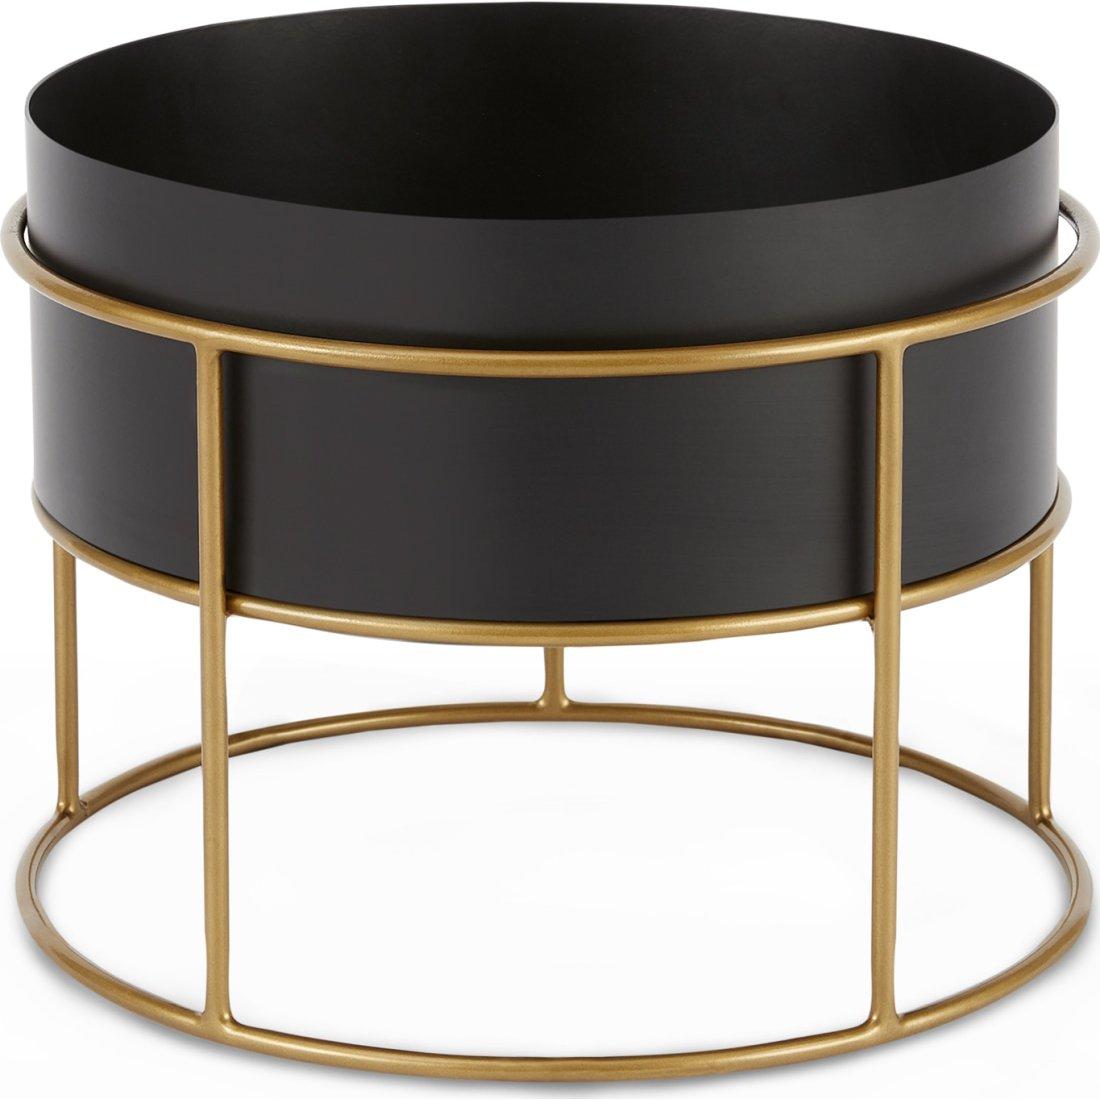 image-Echo Free Standing Round Low Zinc Powdercoated Plant Stand, Black & Metallic Gold